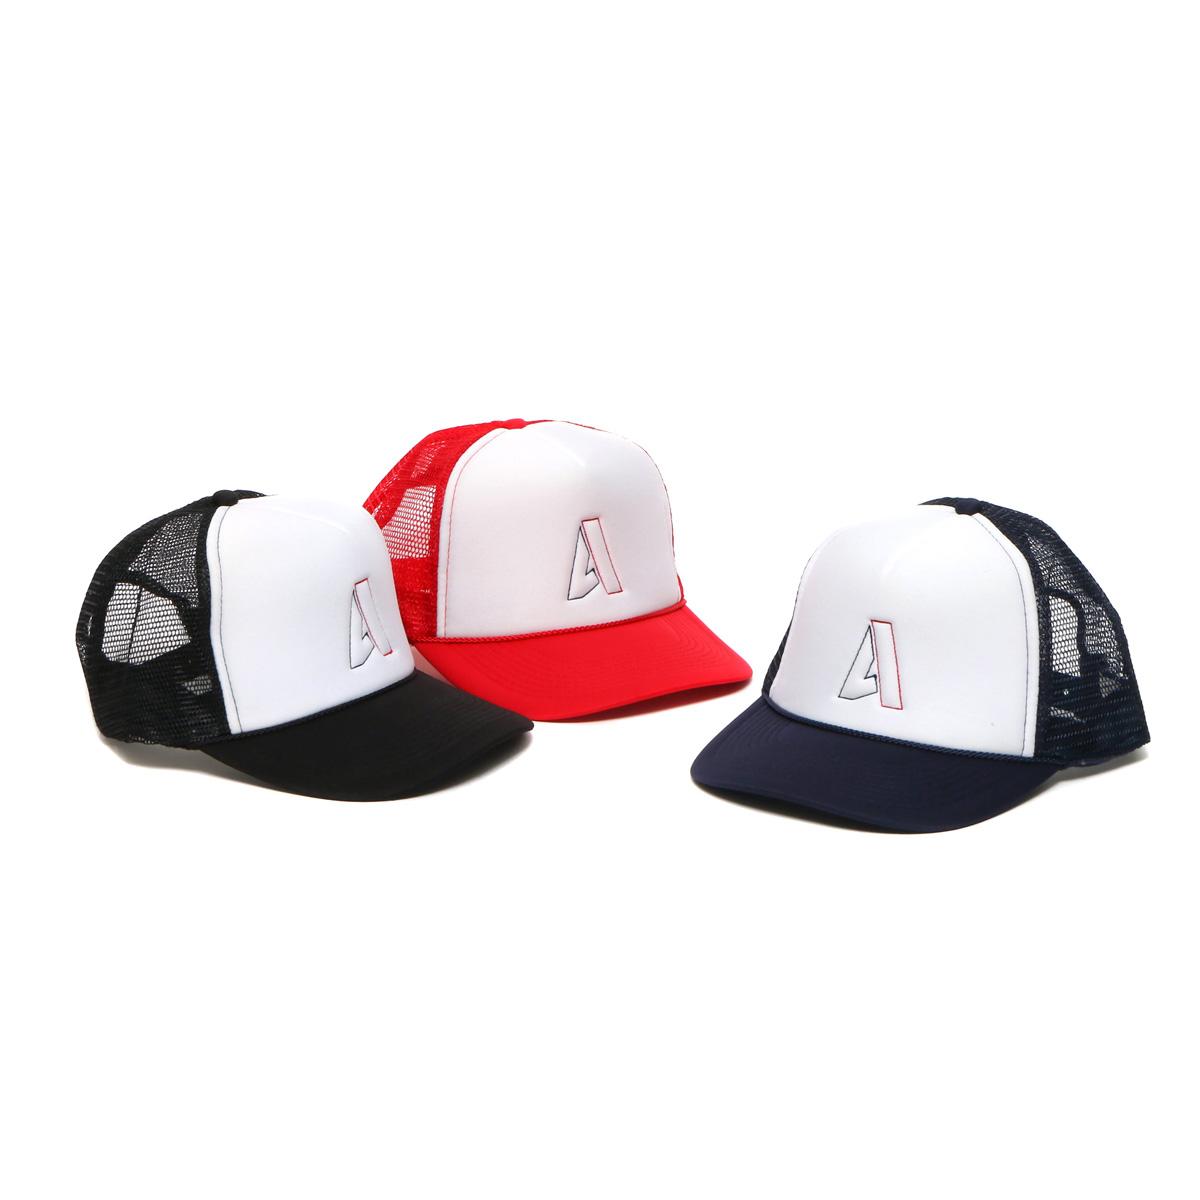 A LOGO MESH CAP